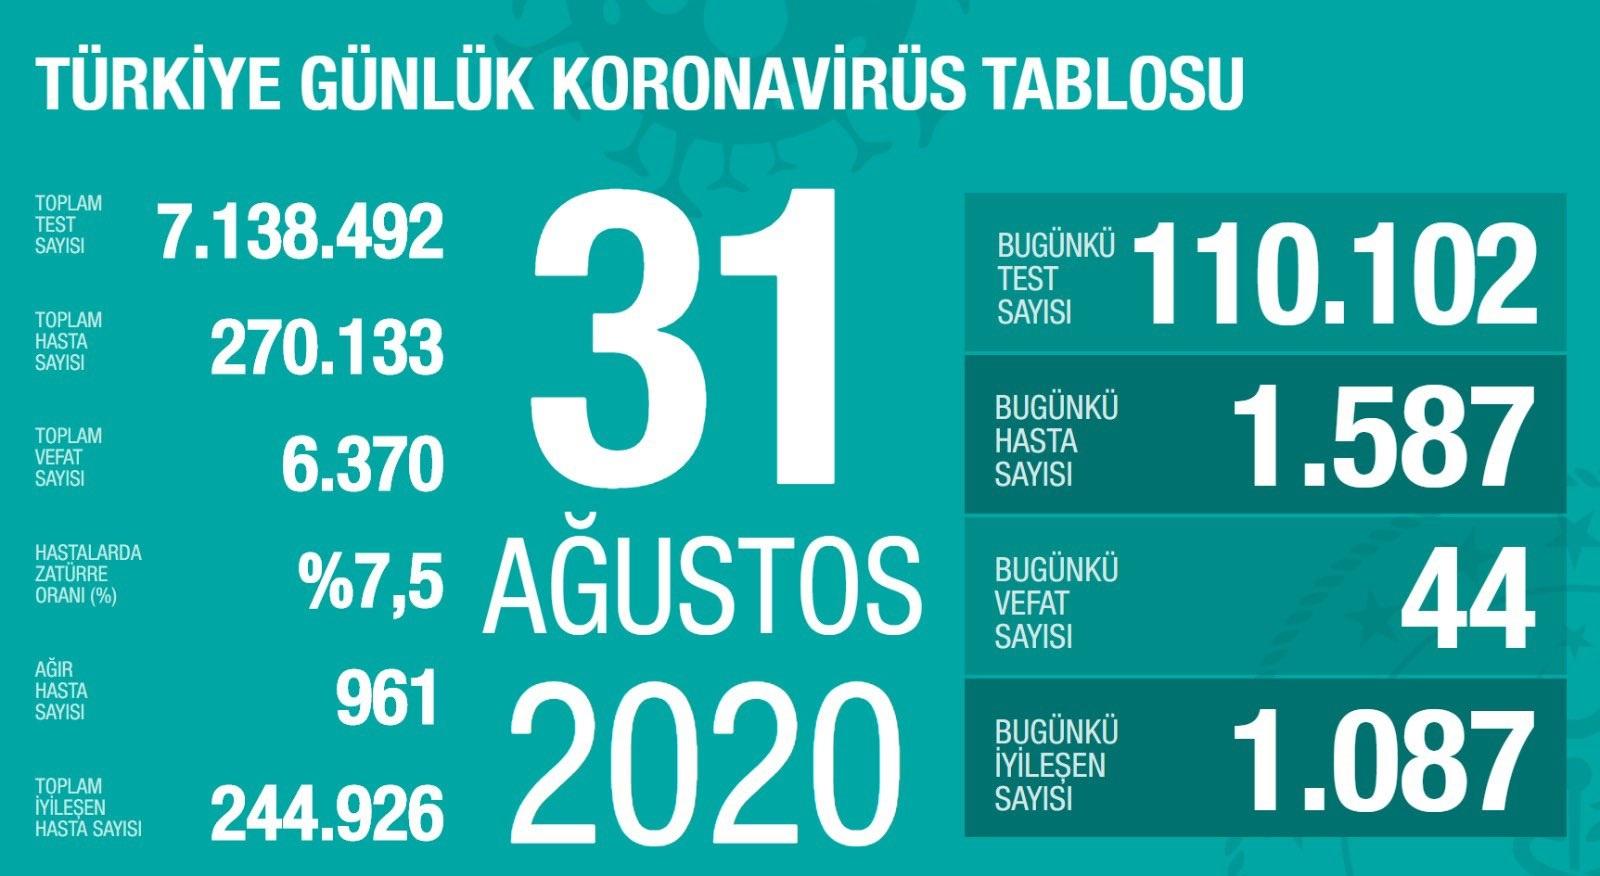 turkiyenin-guncel-koronavirus-tablosu-001.jpg